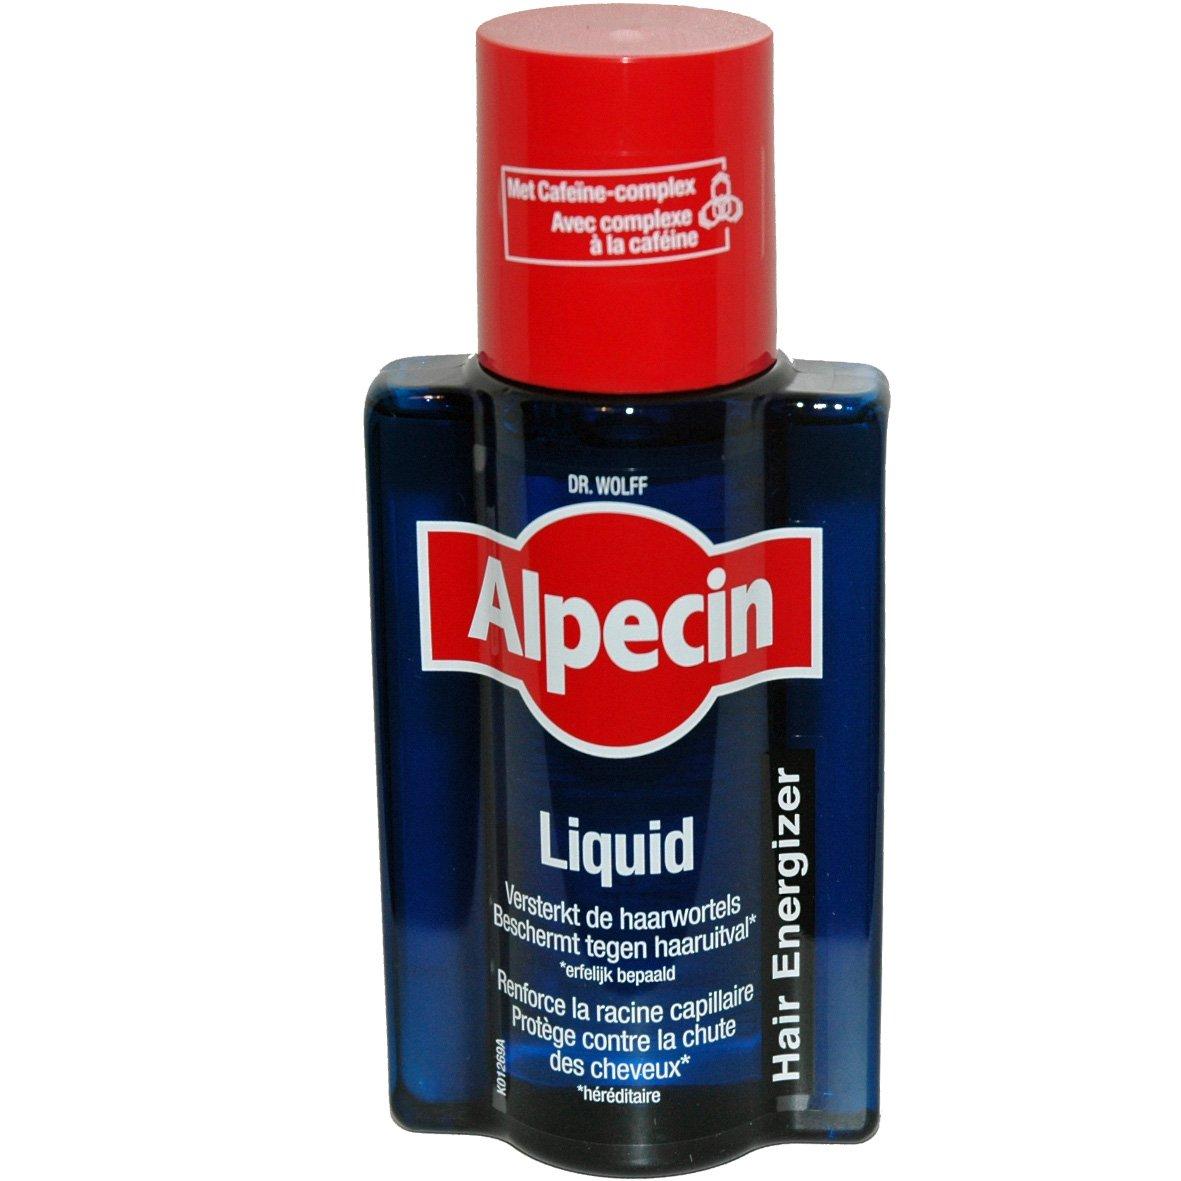 Tinh dầu kích thích mọc tóc Alpecin Coffein Liquid